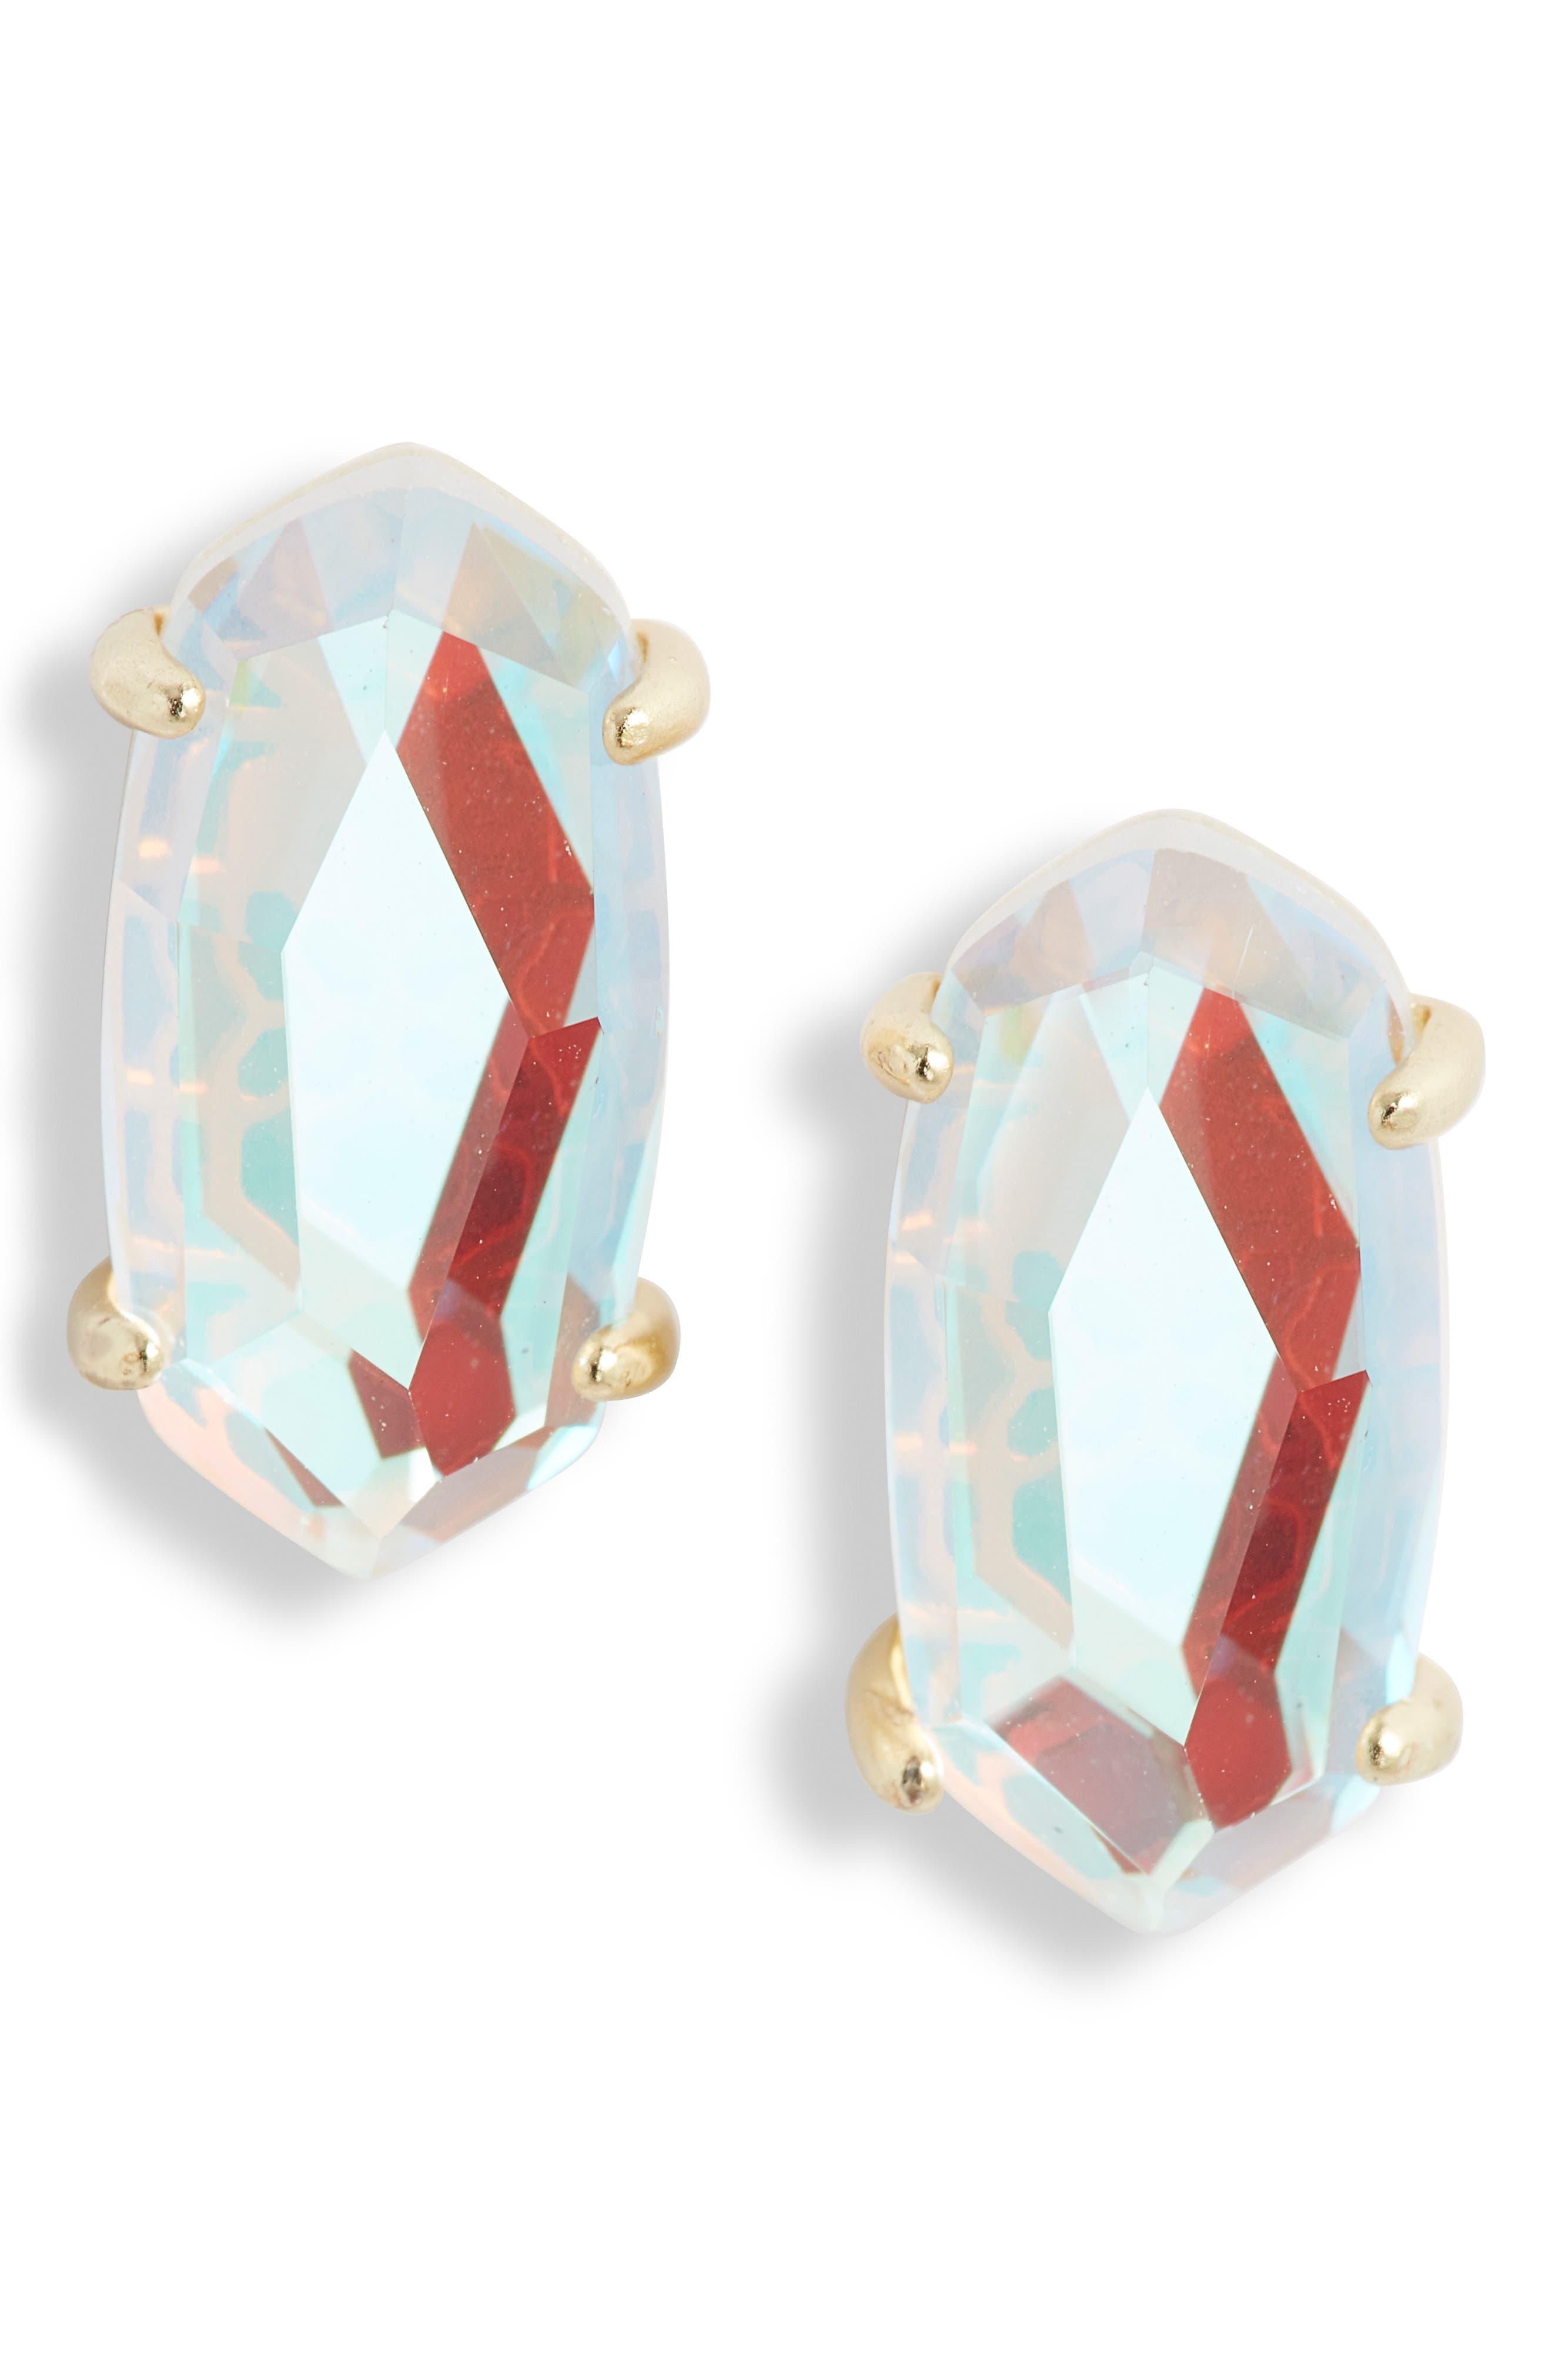 KENDRA SCOTT Betty Stud Earrings, Main, color, DICHROIC GLASS/ GOLD